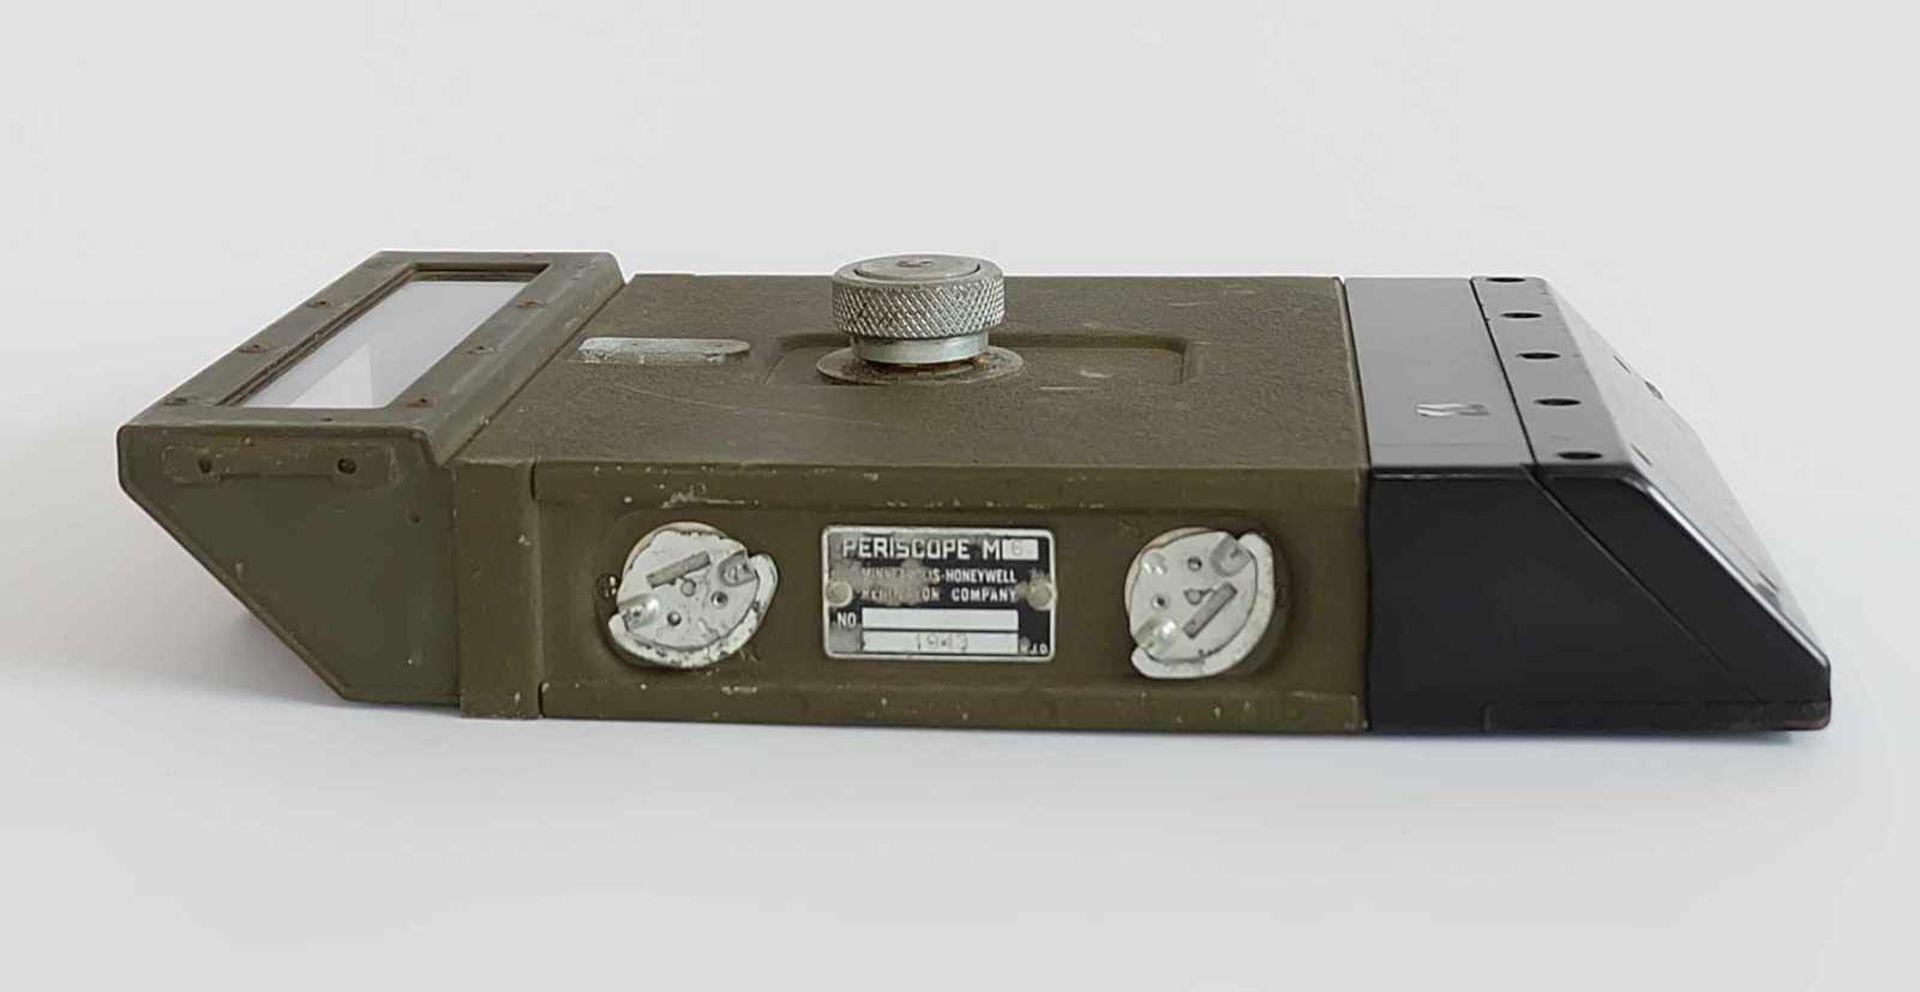 PERISKOP, Honeywell Regulator Comp./ Minneapolis, 1943, Optik für Sherman-Panzer, - Bild 2 aus 2